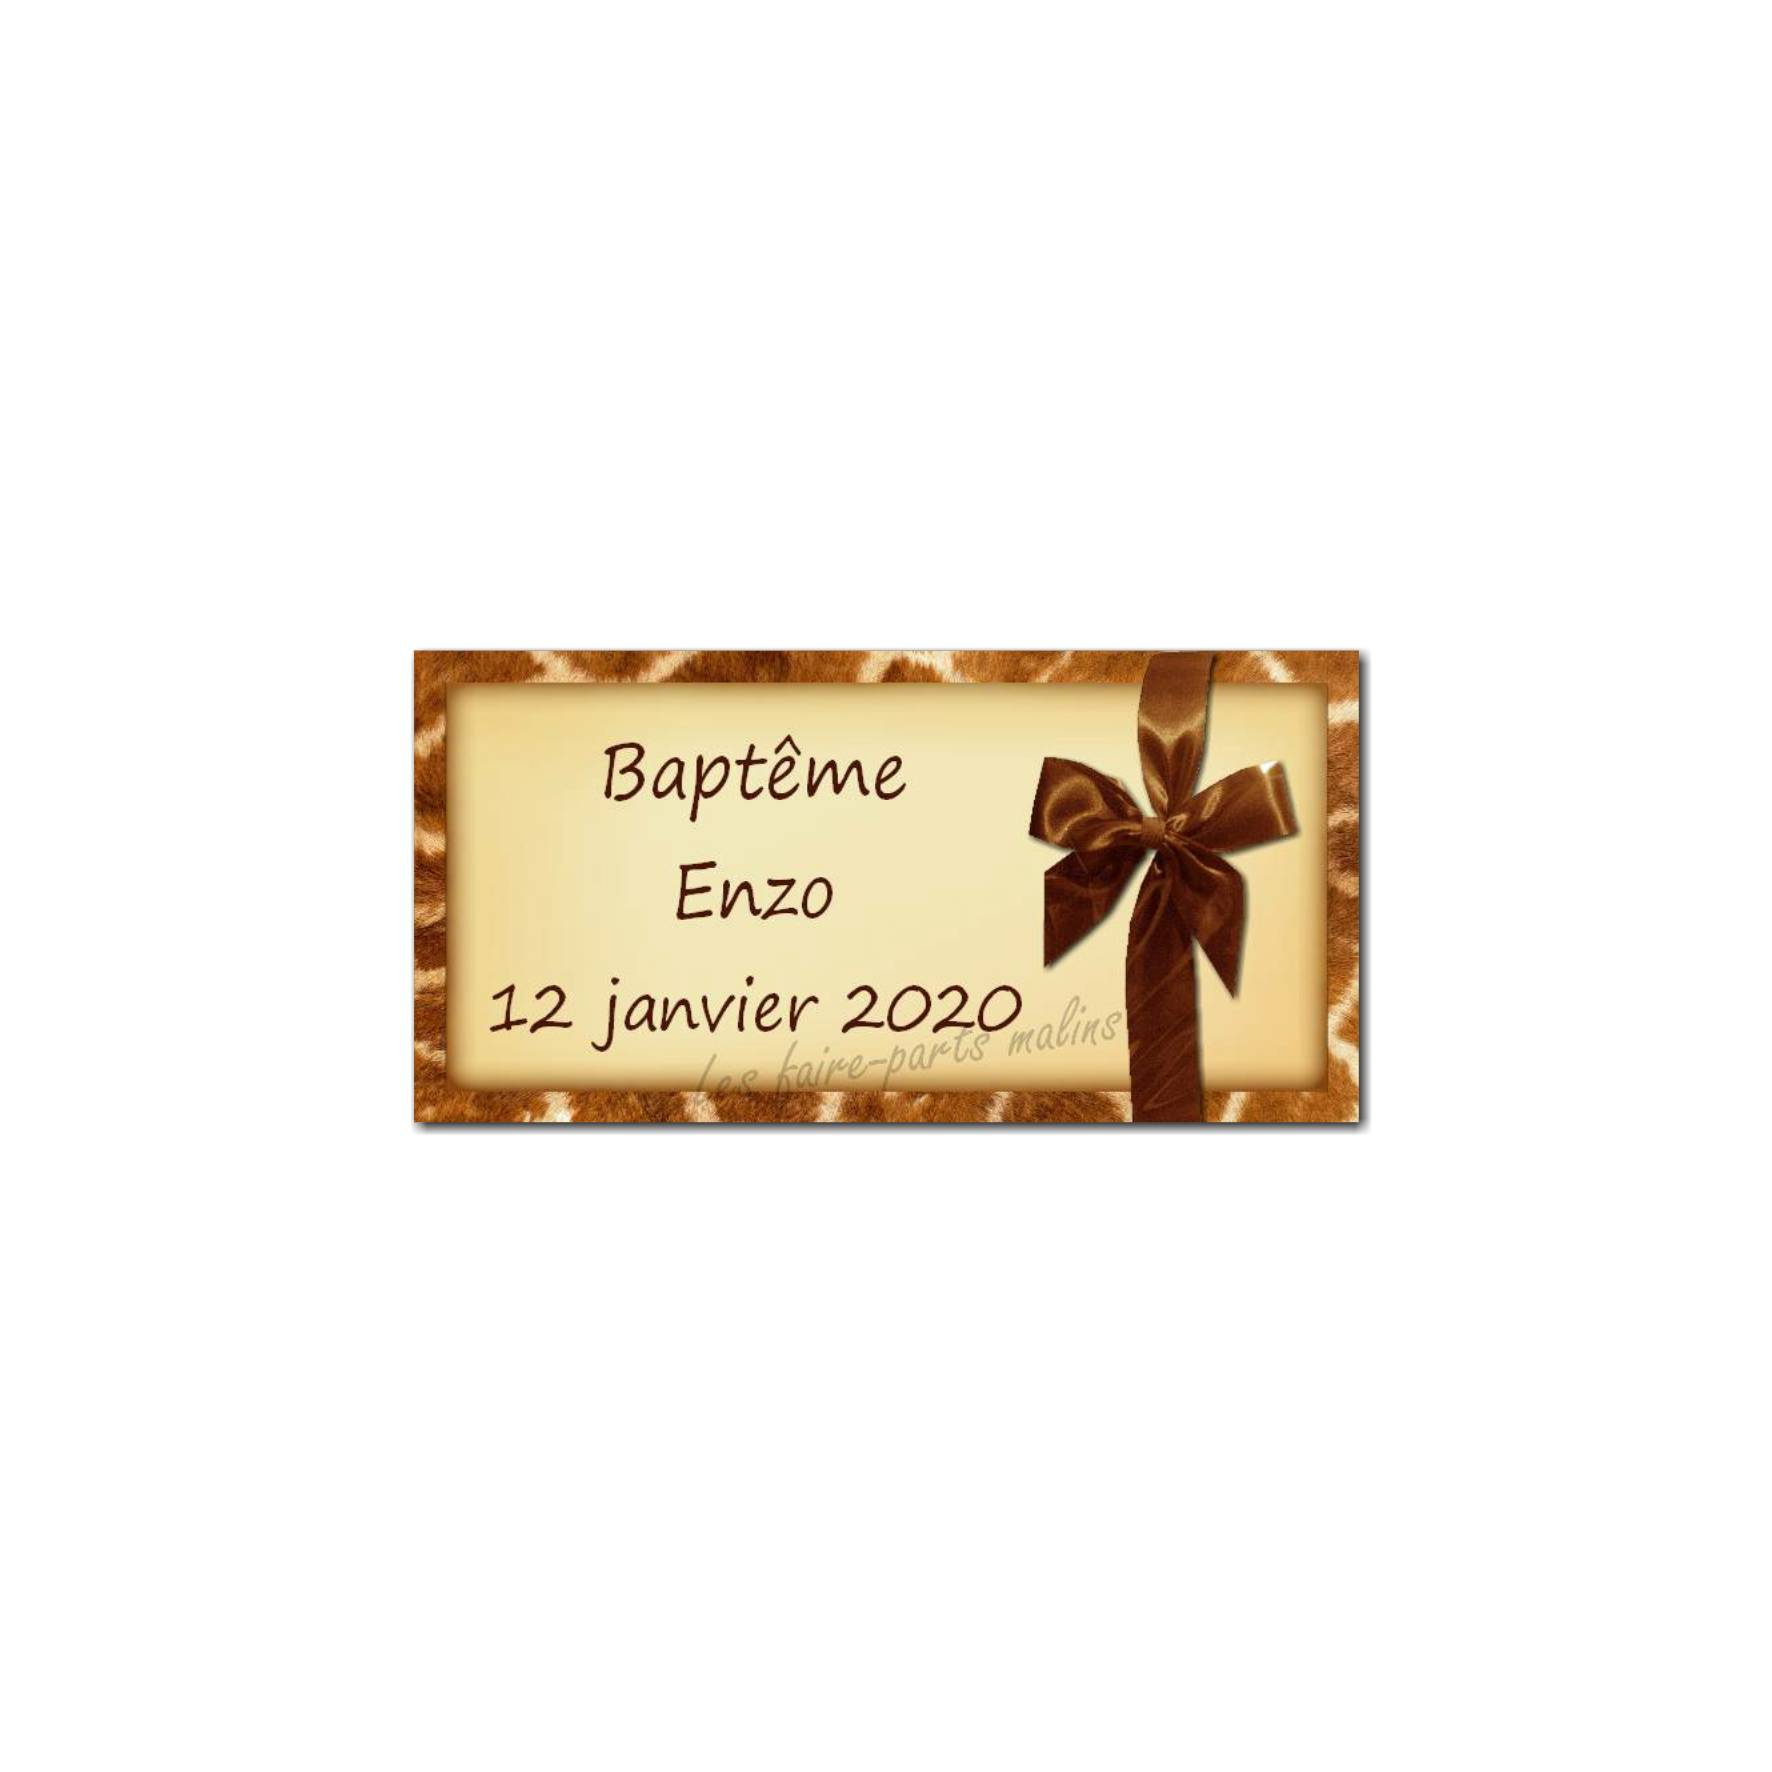 Etiquette dragées fond girafe et ruban marron